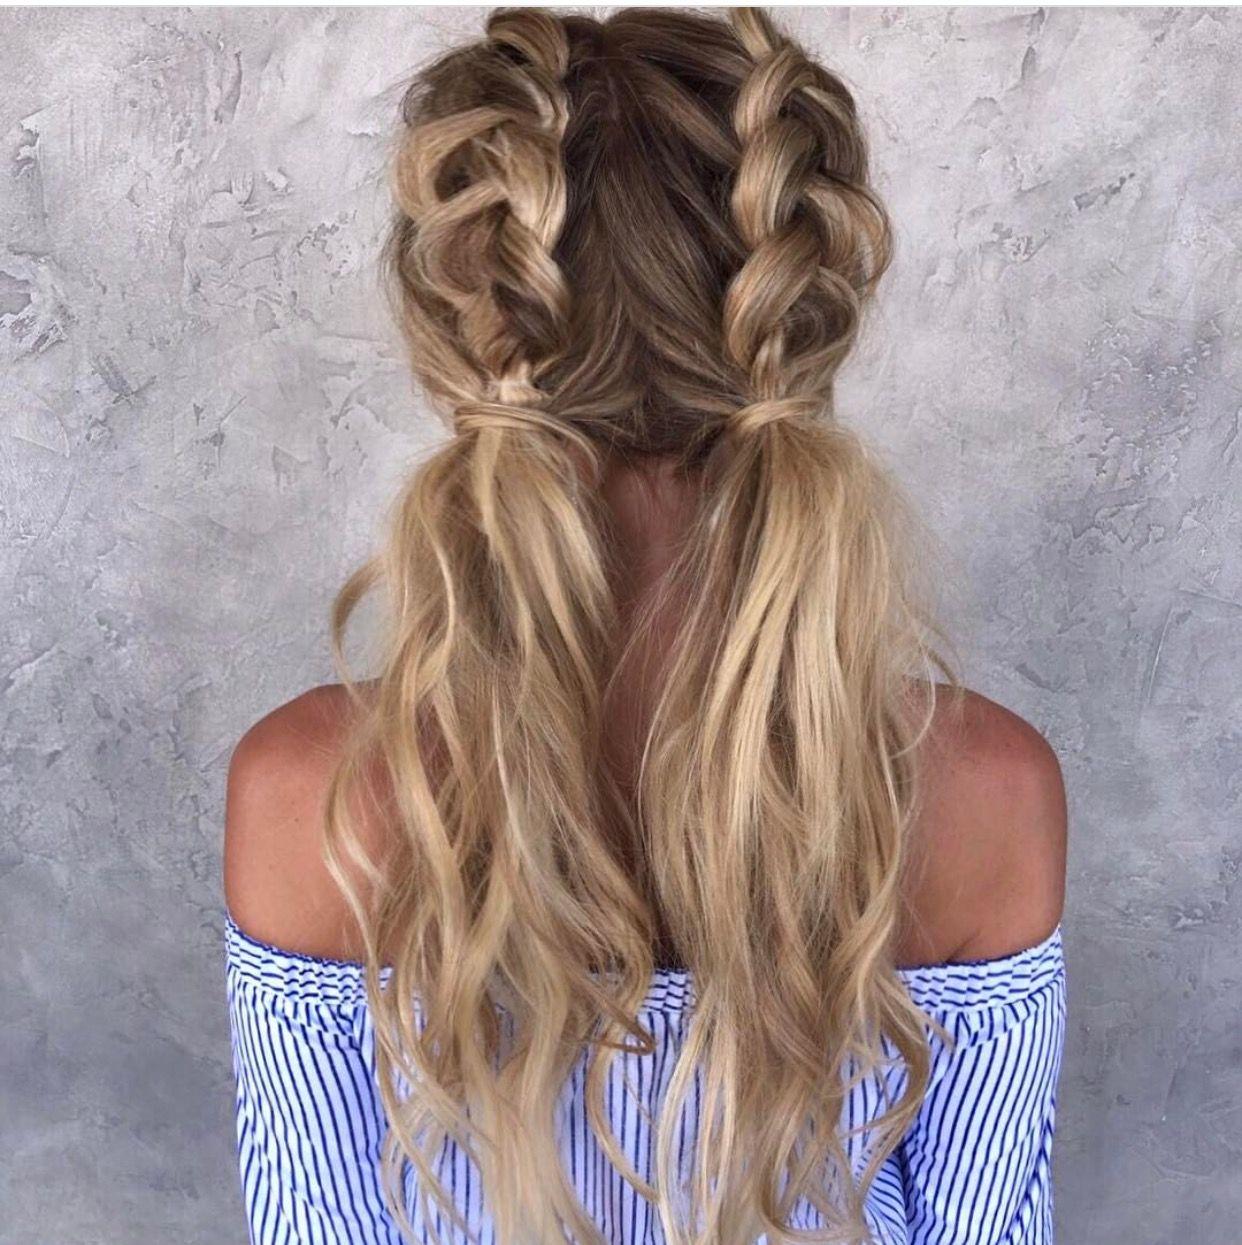 Half Dutch braided pigtails | Long hair styles, Hair styles, Blonde hair inspiration